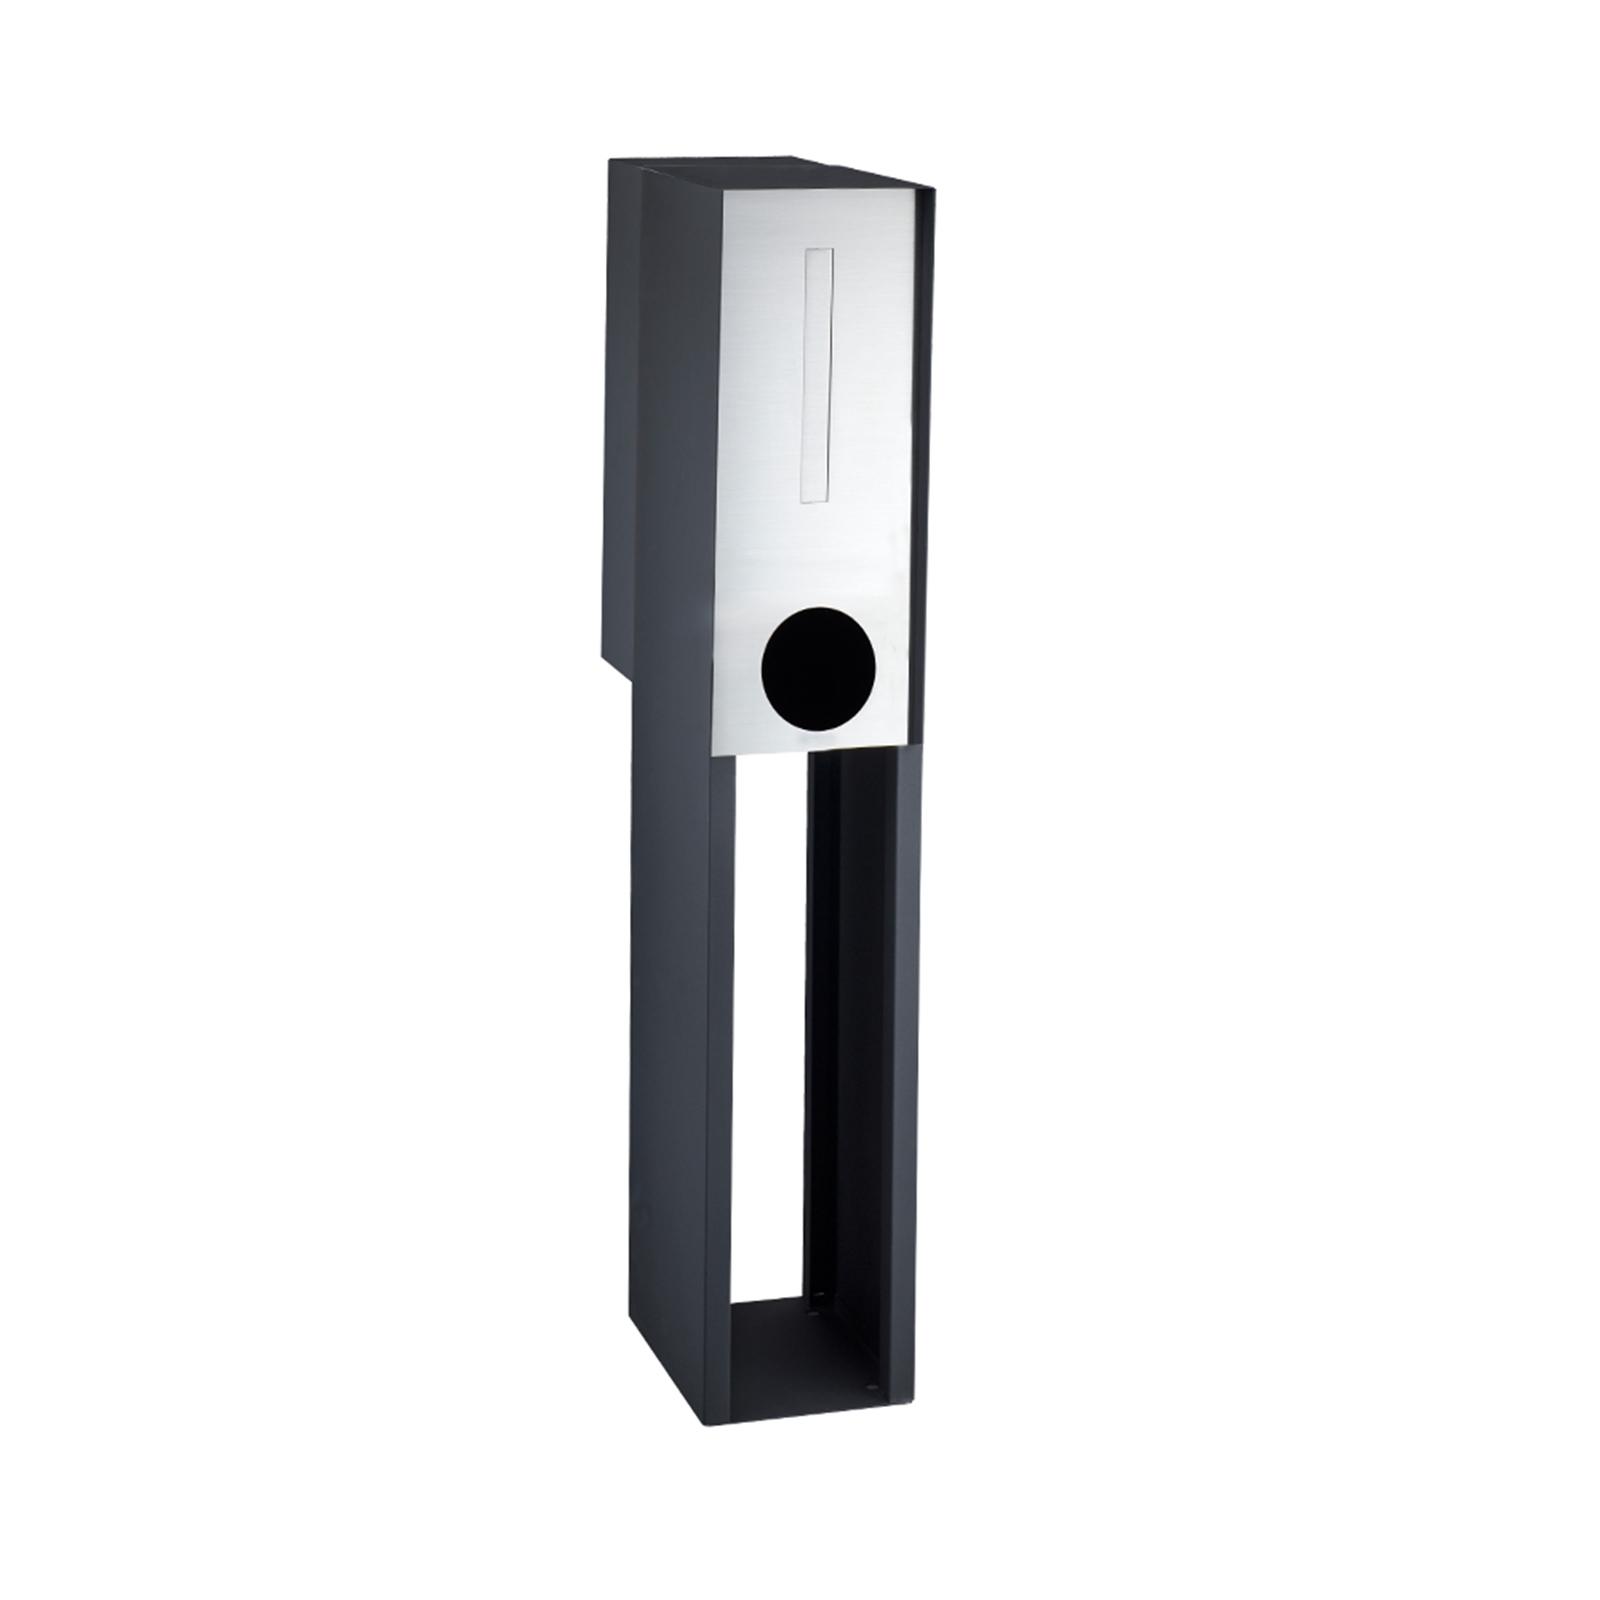 Sandleford Black Stainless Steel Empire Pillar Letterbox